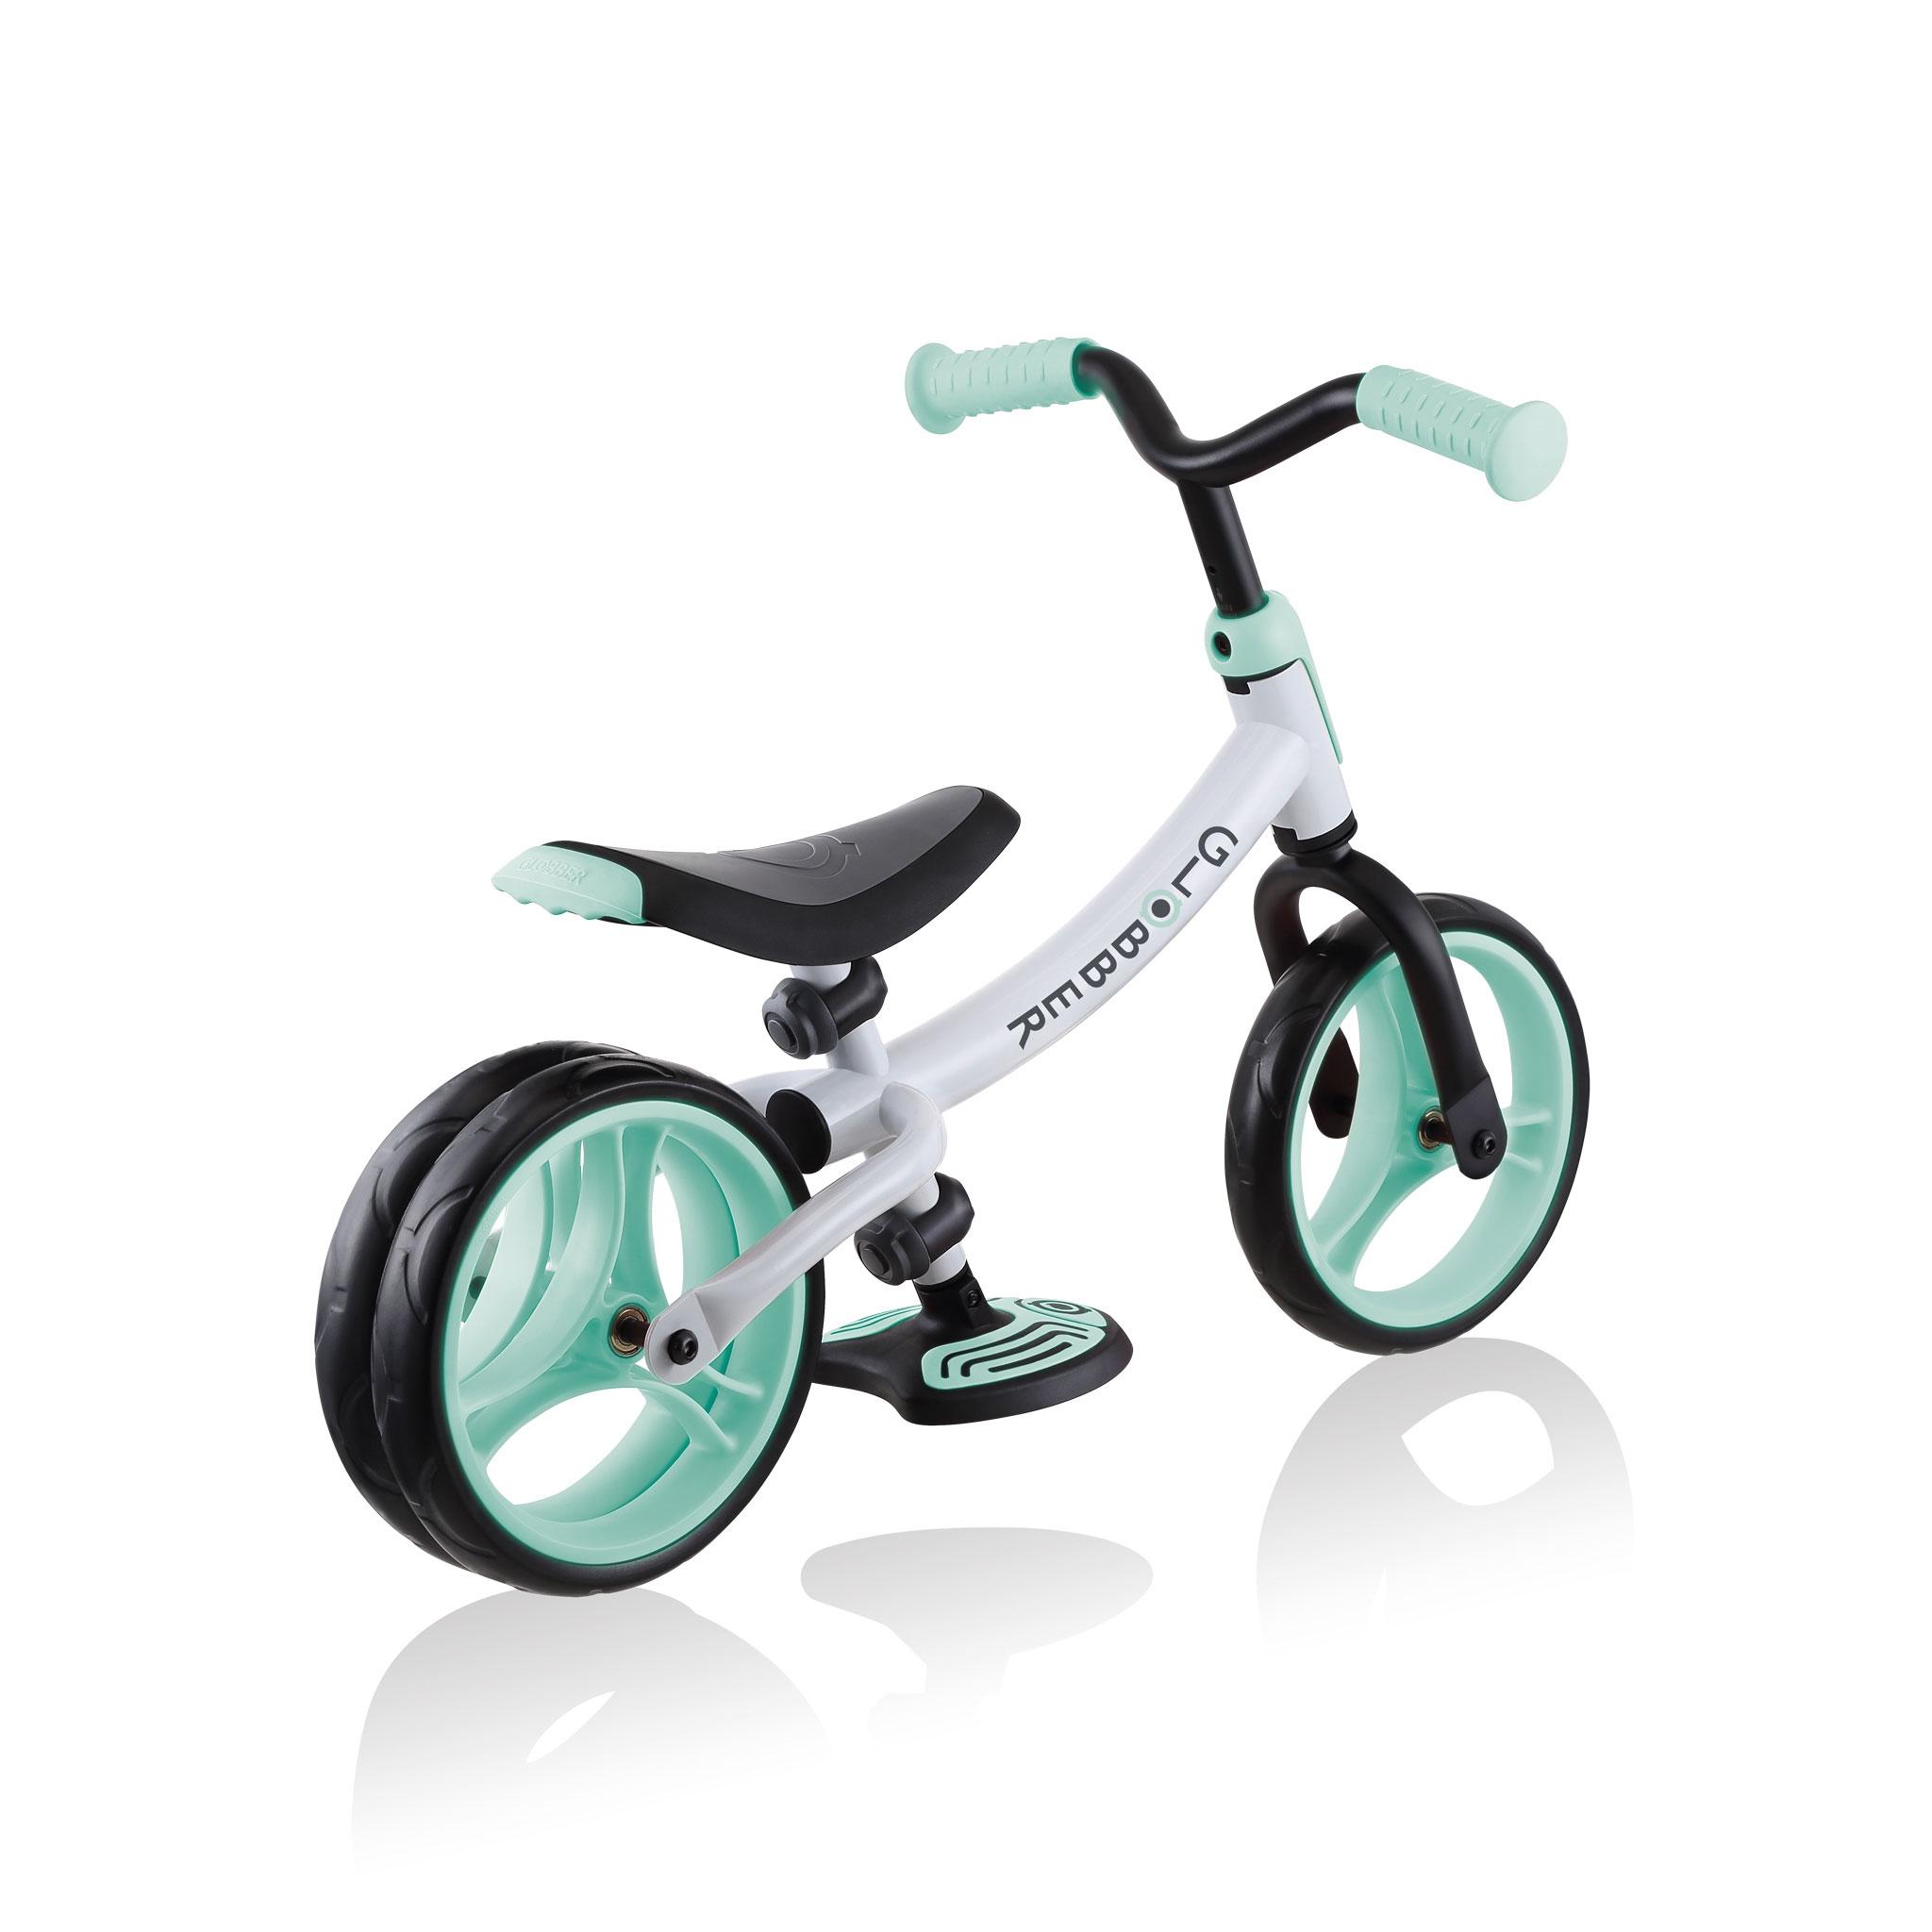 GO-BIKE-DUO-dual-rear-wheel-toddler-balance-bike-aids-balance-and-develops-motor-skills_mint 4